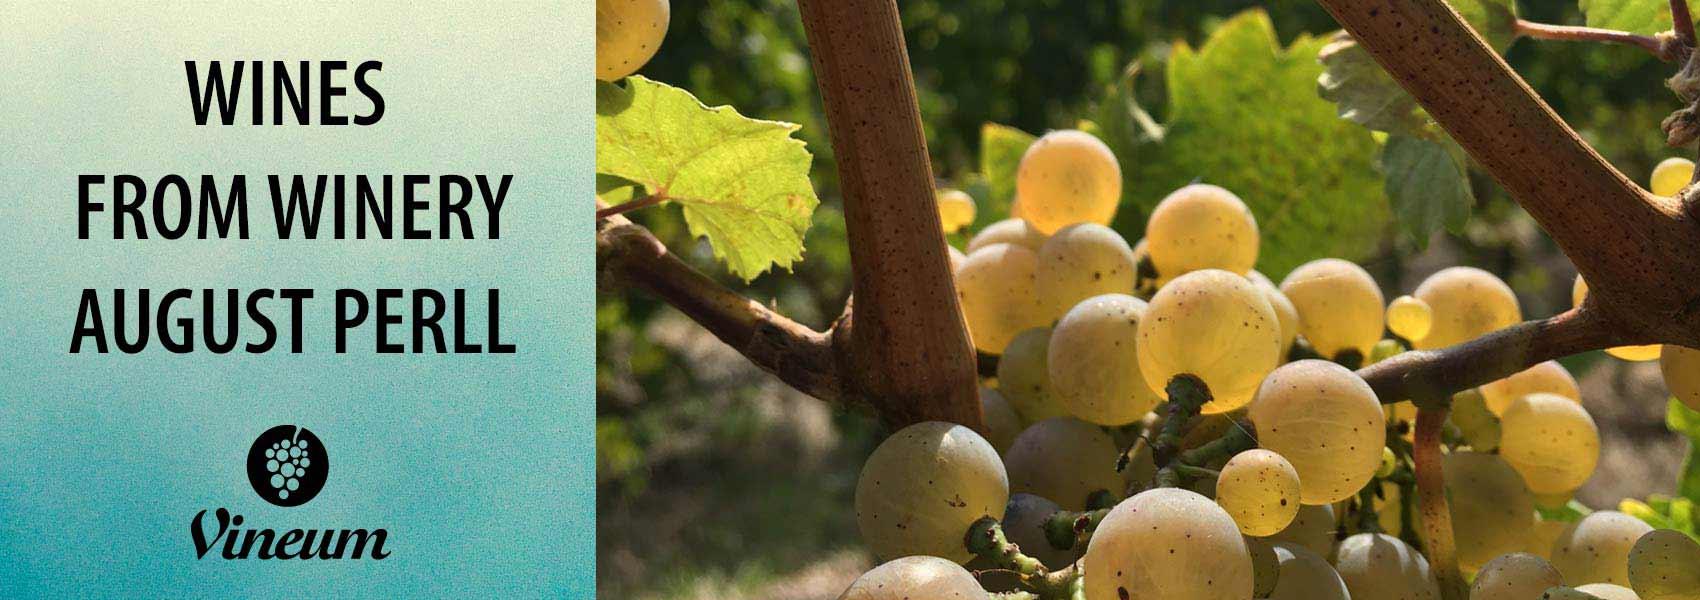 August Perll Wines